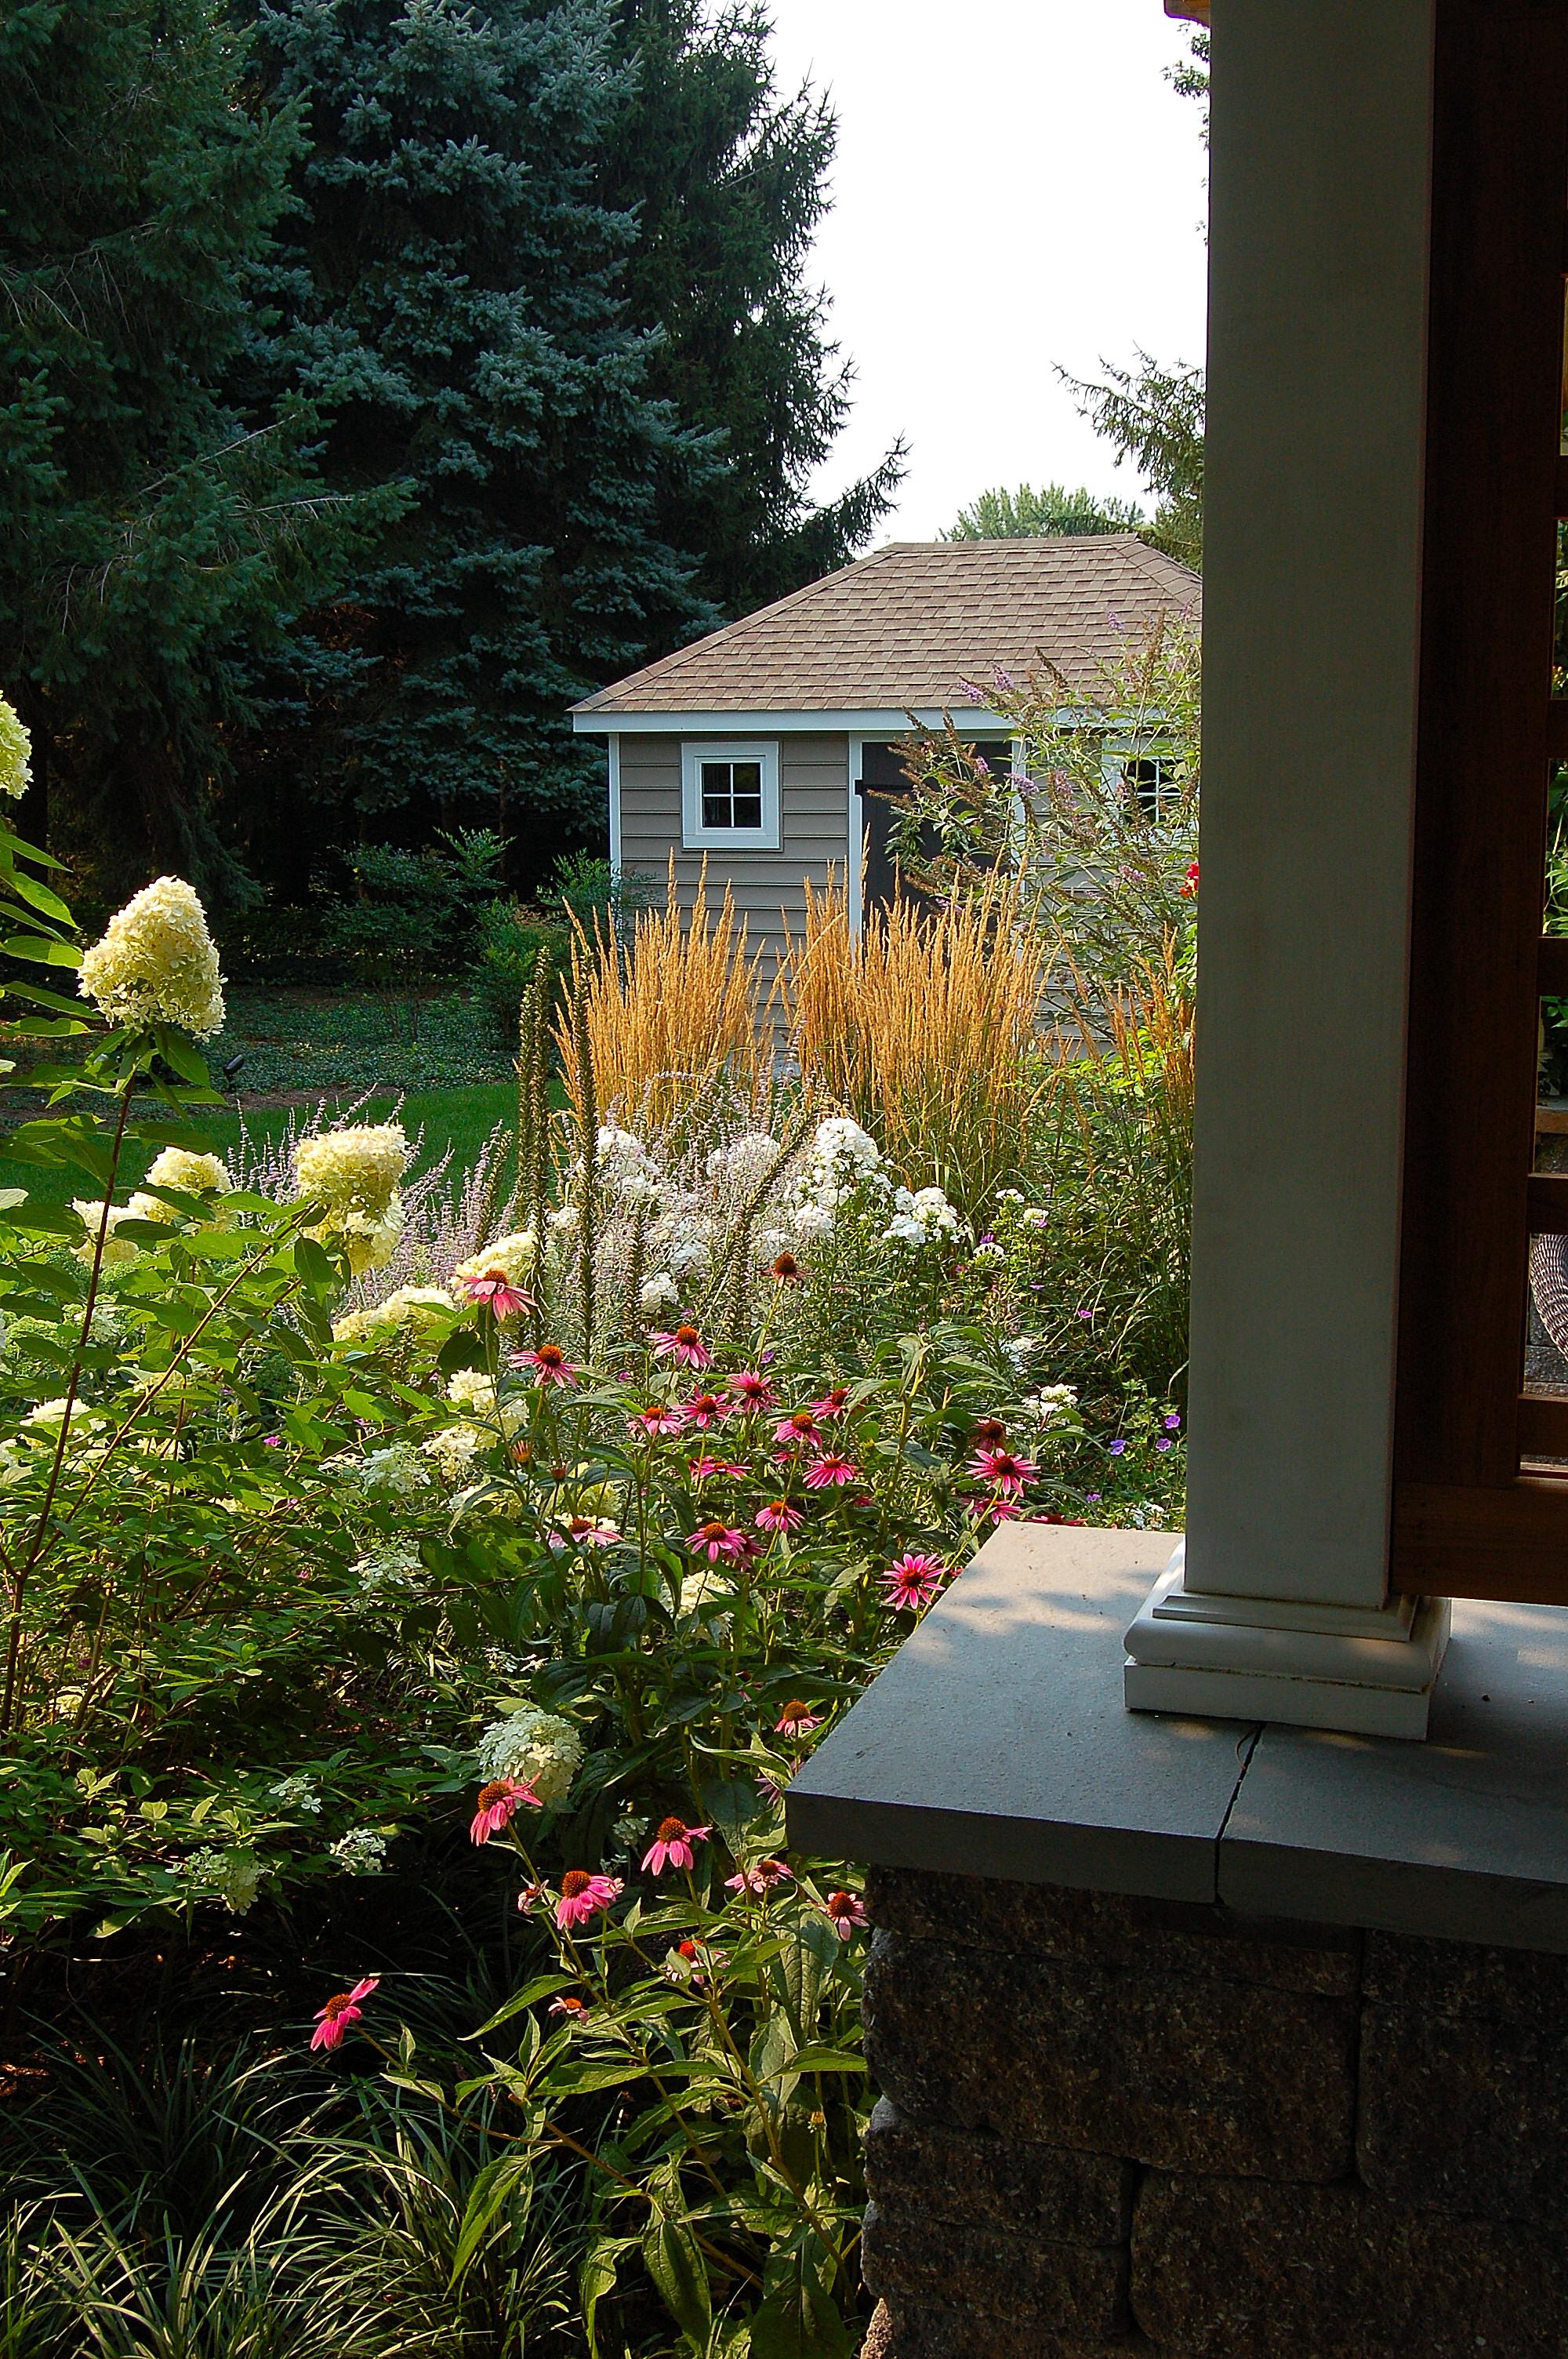 Garden design and patio in Lititz, PA